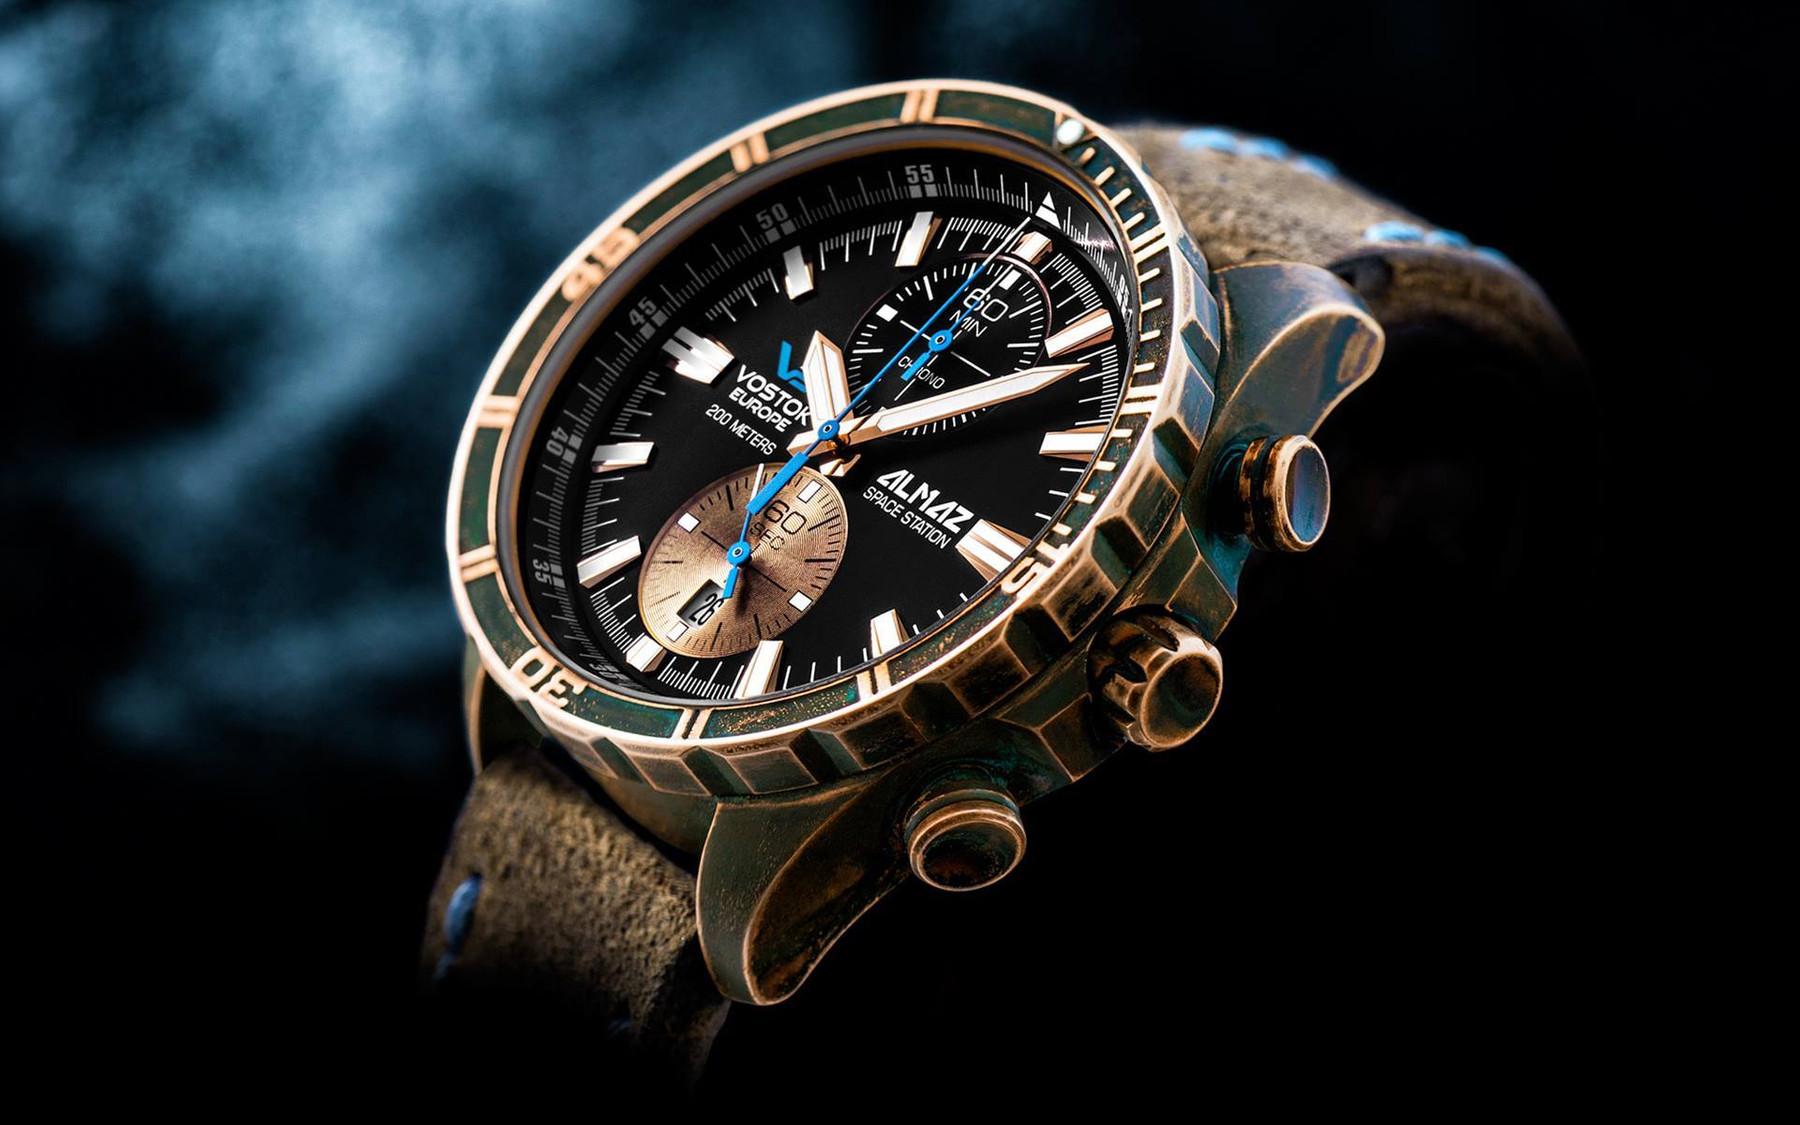 Bild 2 Vostok Europe Almaz 6S11-320O266 Bronze Chronograph